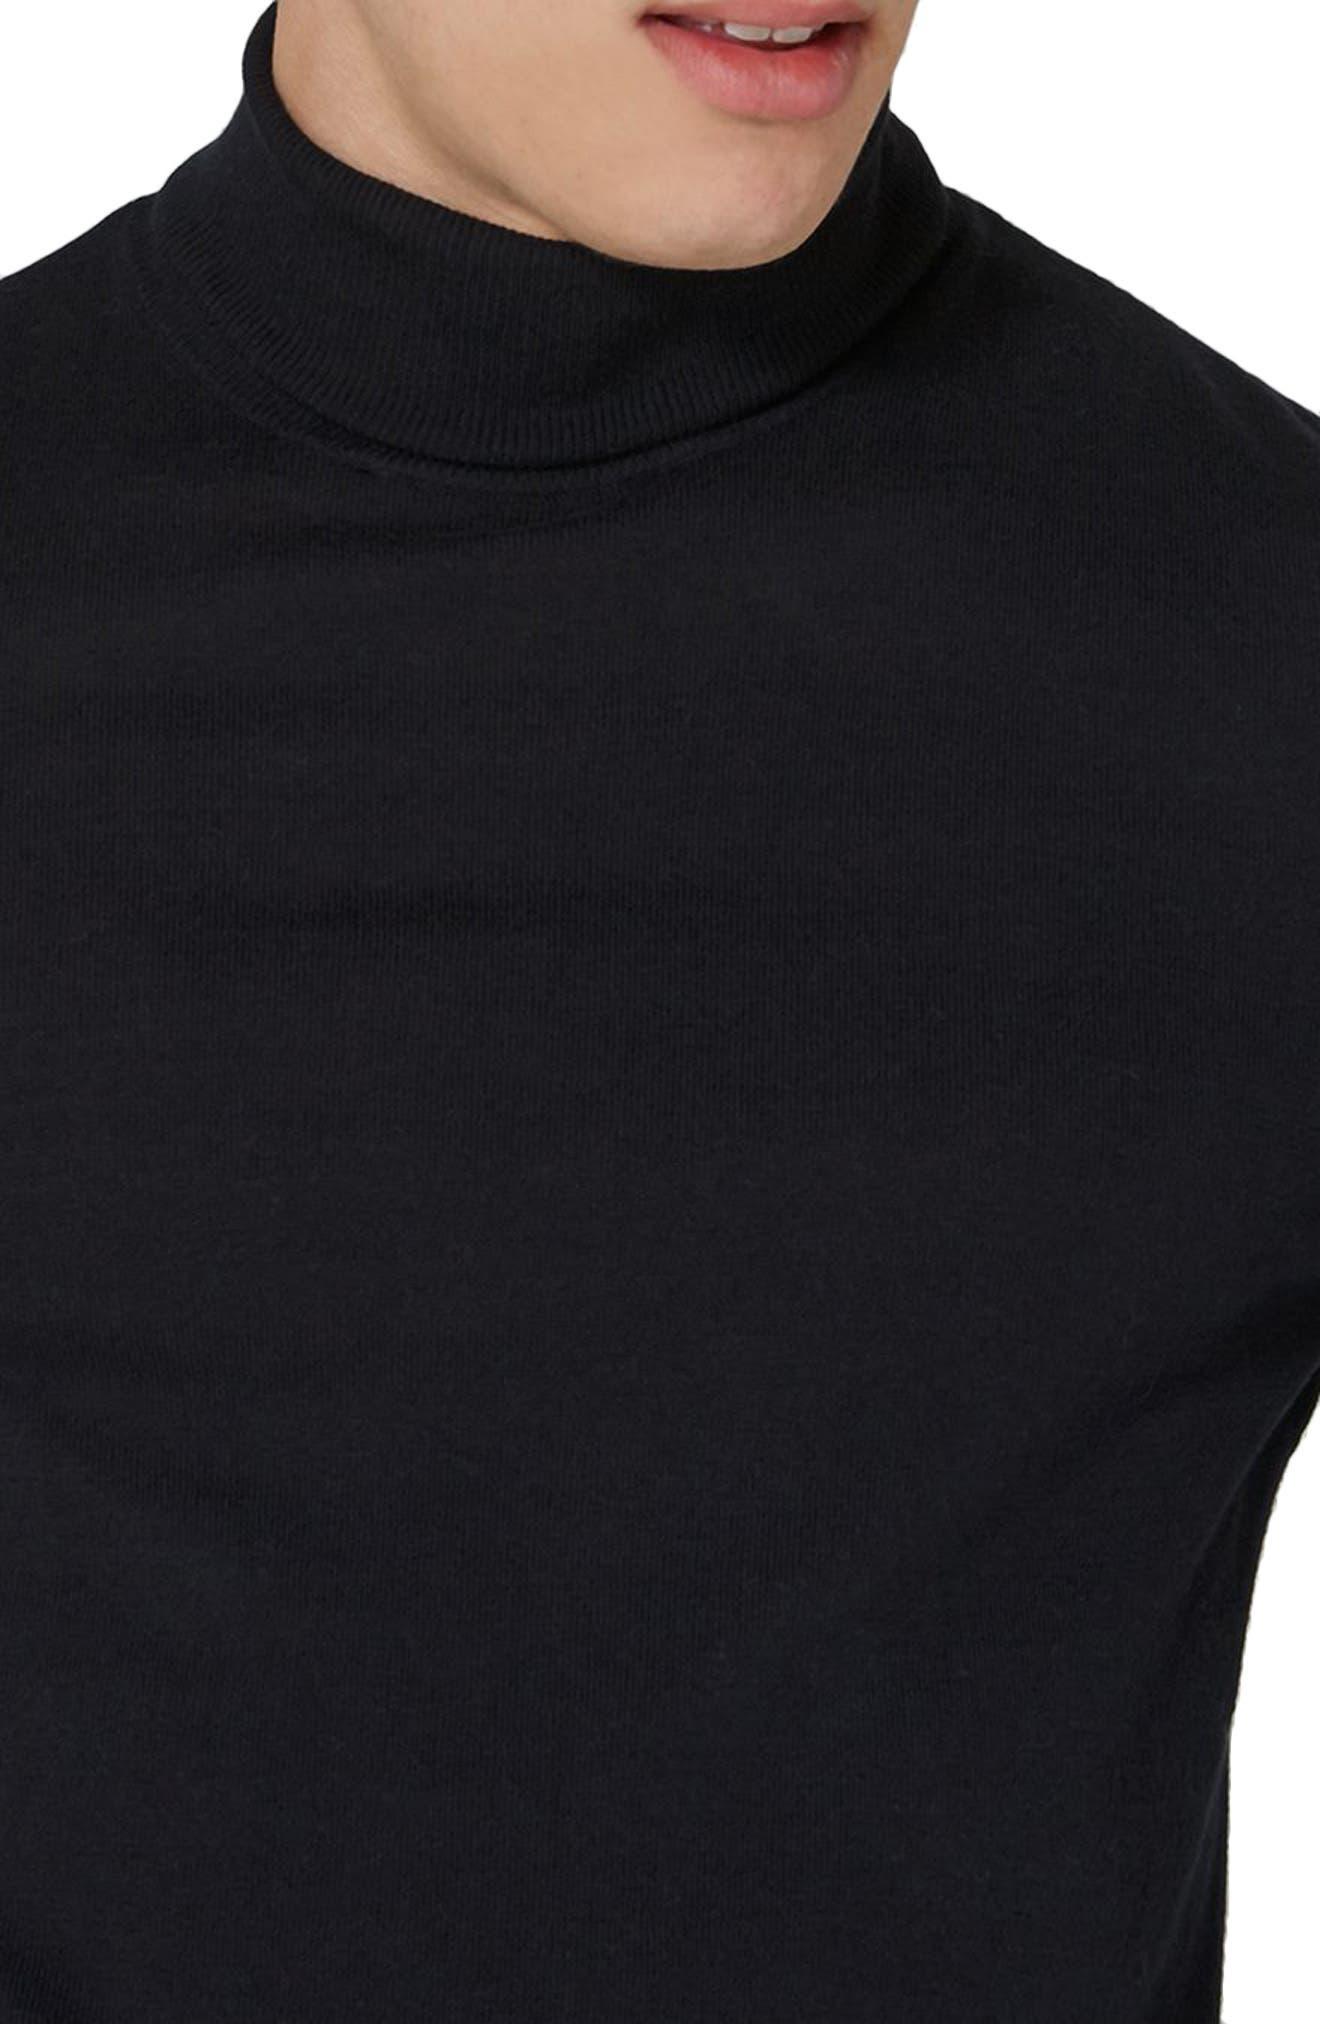 Cotton Turtleneck Sweater,                             Alternate thumbnail 3, color,                             001